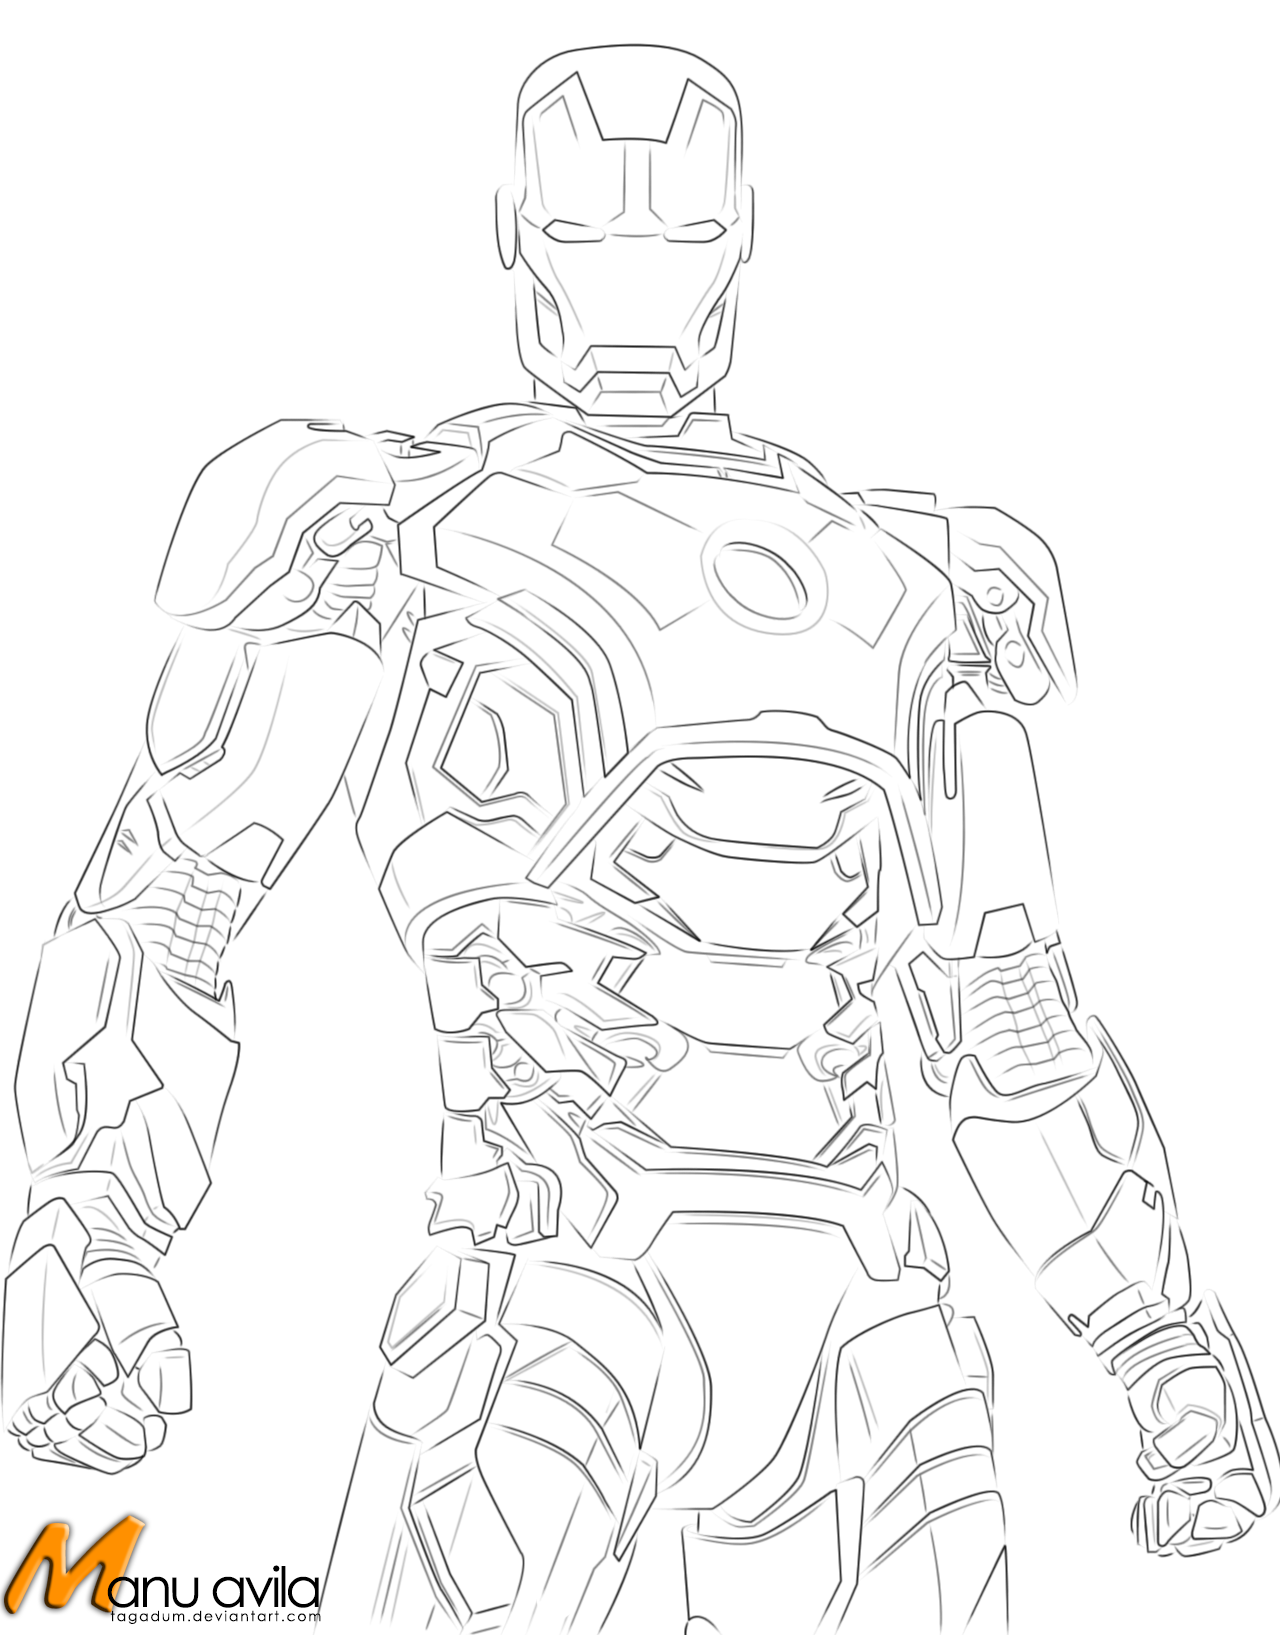 iron man 3 coloring pages free printable iron man coloring pages for kids cool2bkids 3 iron pages coloring man